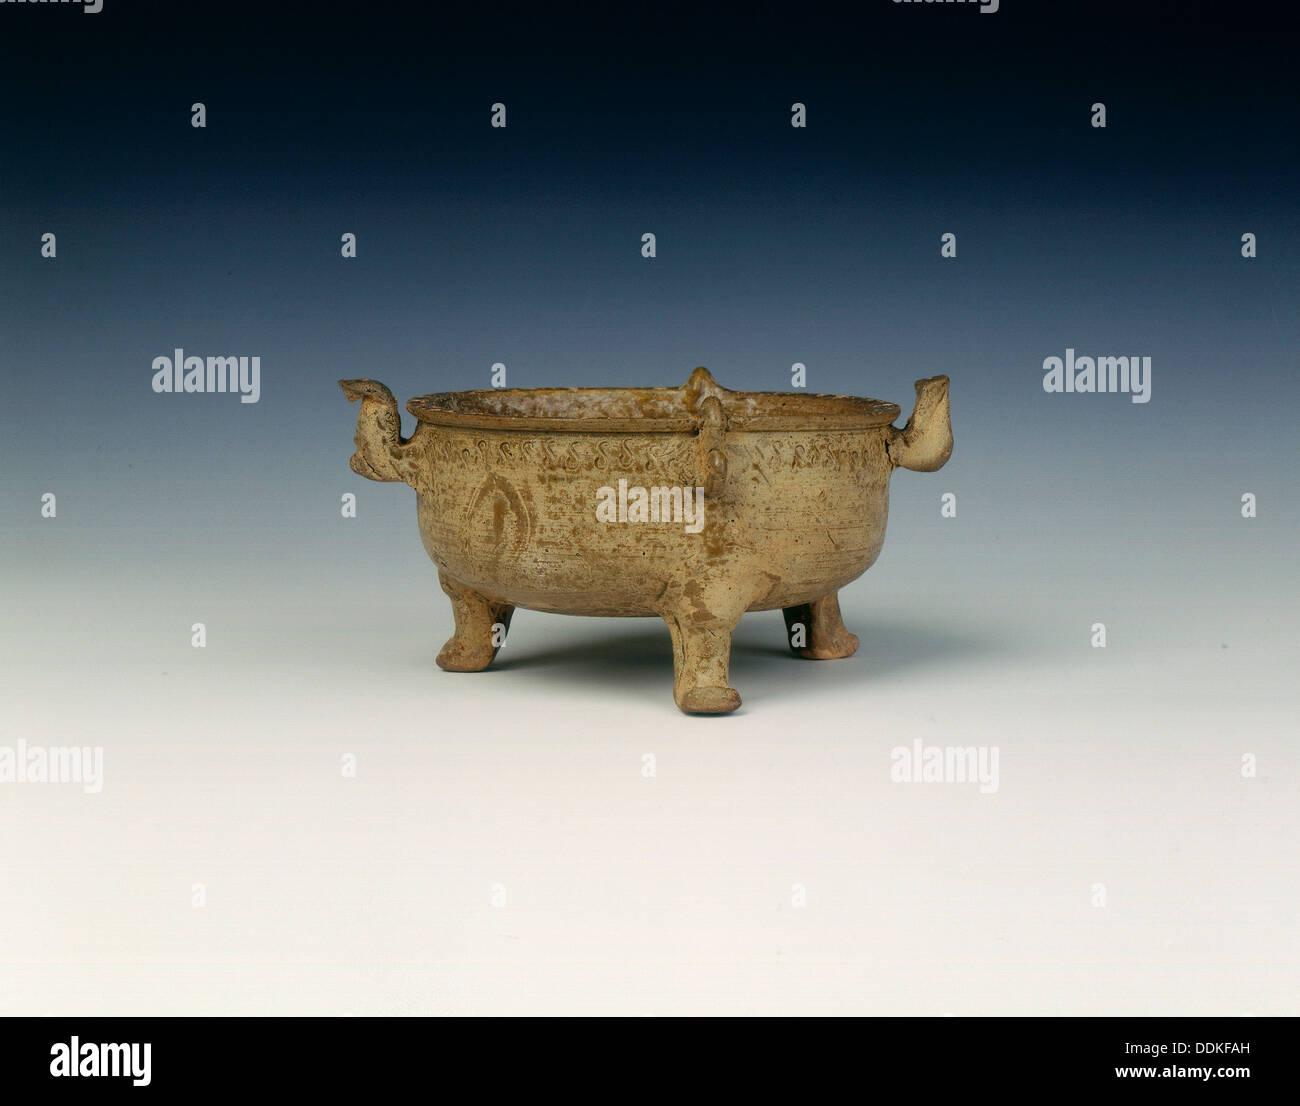 Proto-Yue tripod pot, Late Warring States, China, c3rd-2nd century BC. - Stock Image